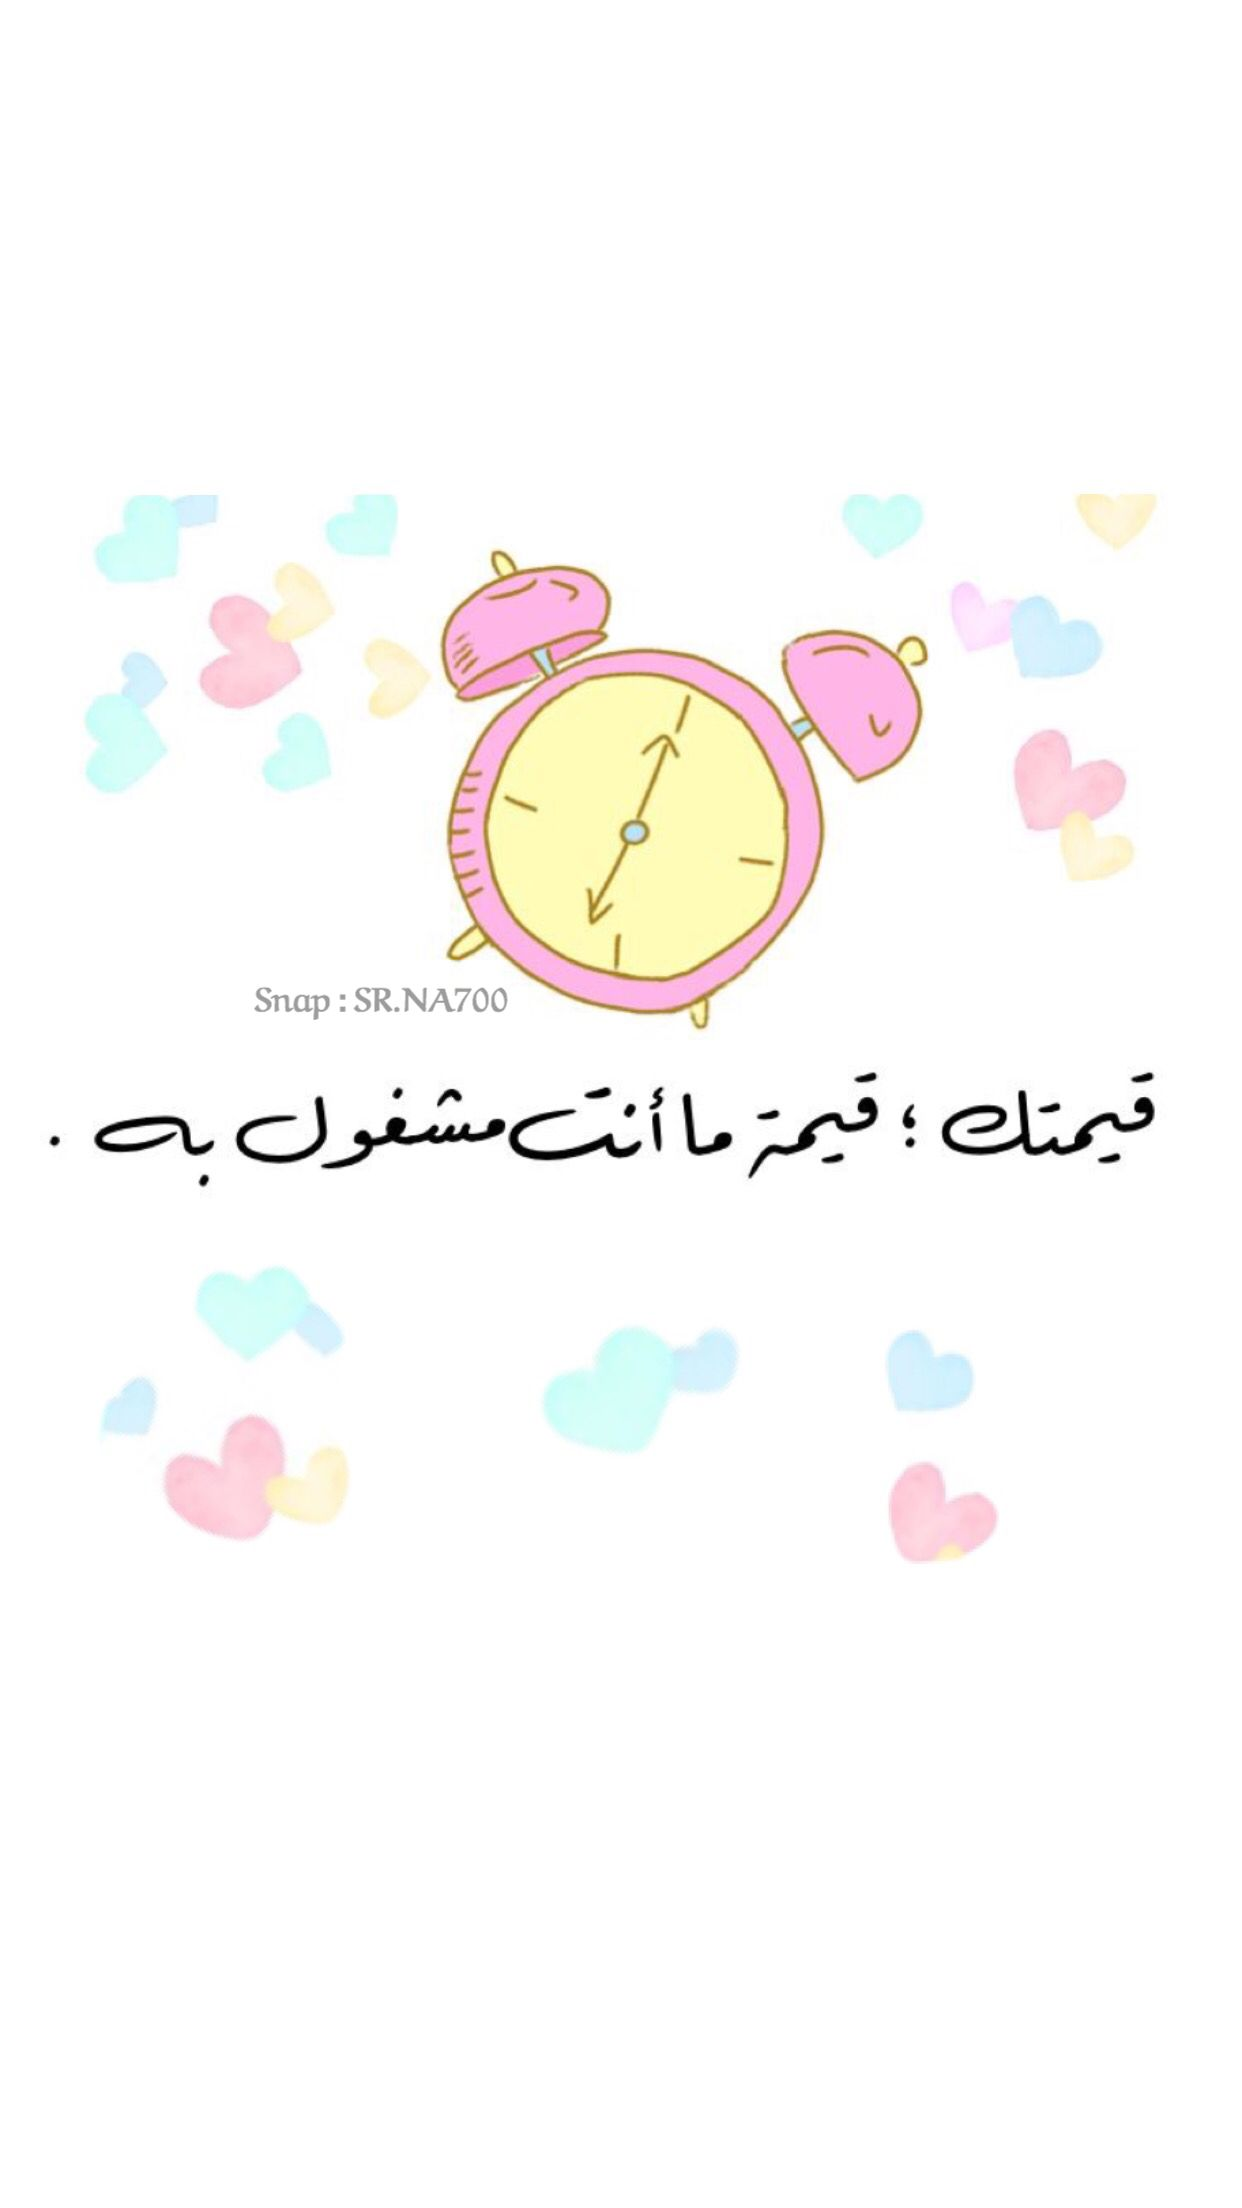 Pin By Hadeel M On ايجابي متفائل تفائل تفاؤل ايجابية ايجابيات فرح سرور متعه وناسه تطوير ذات نجاح حب احبك كلمات امل Quran Quotes Love Funny Arabic Quotes Arabic Quotes